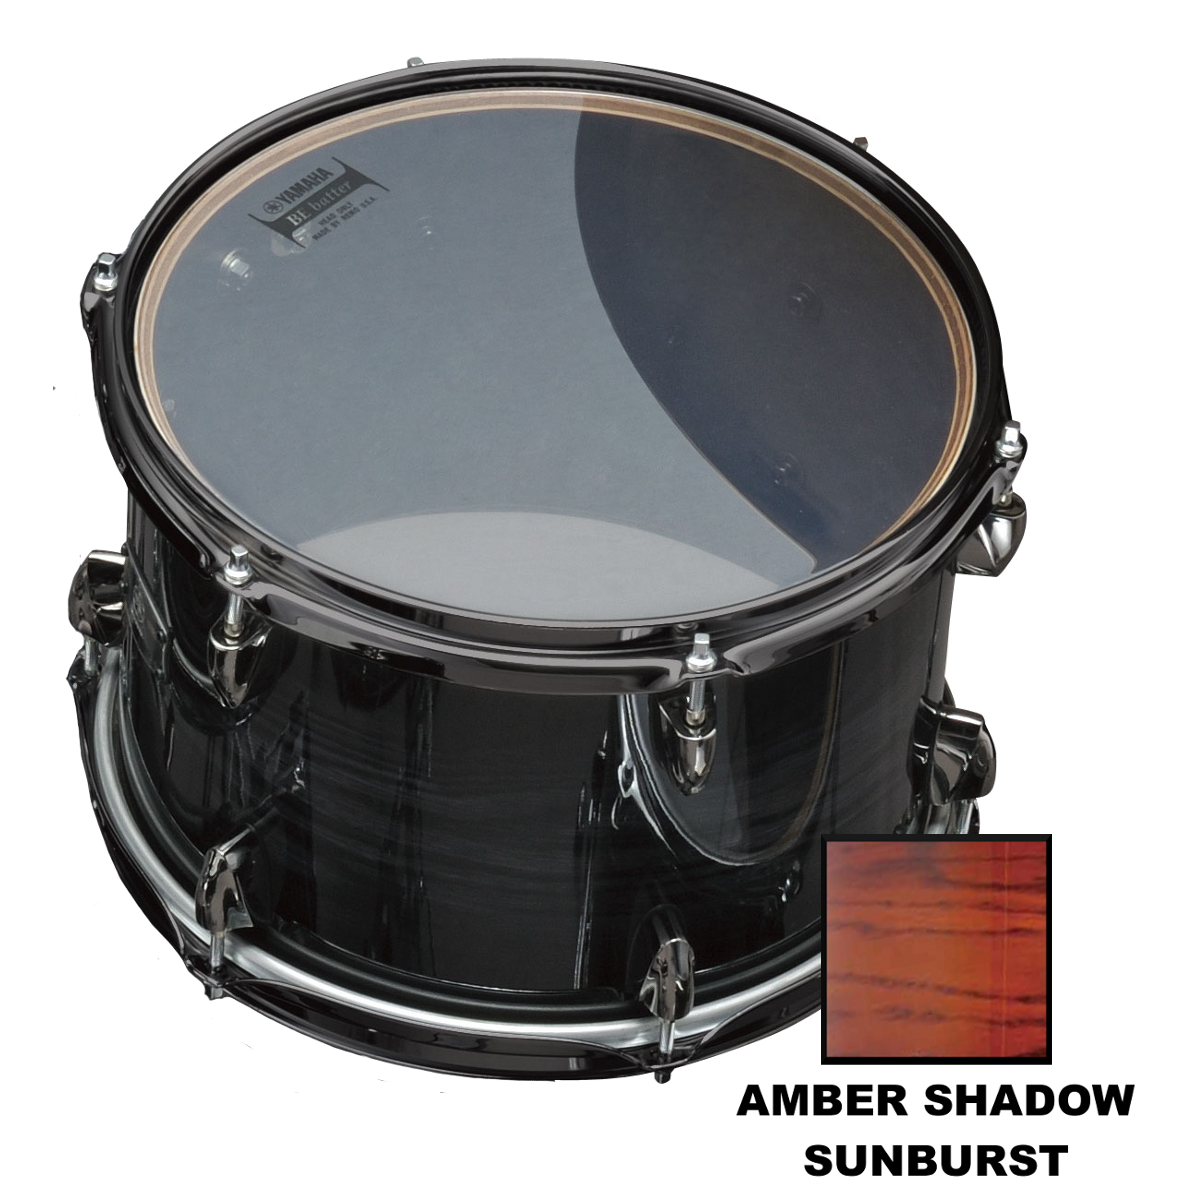 Yamaha Lnt0807 - 8 X 7 - Amber Shadow Sunburst